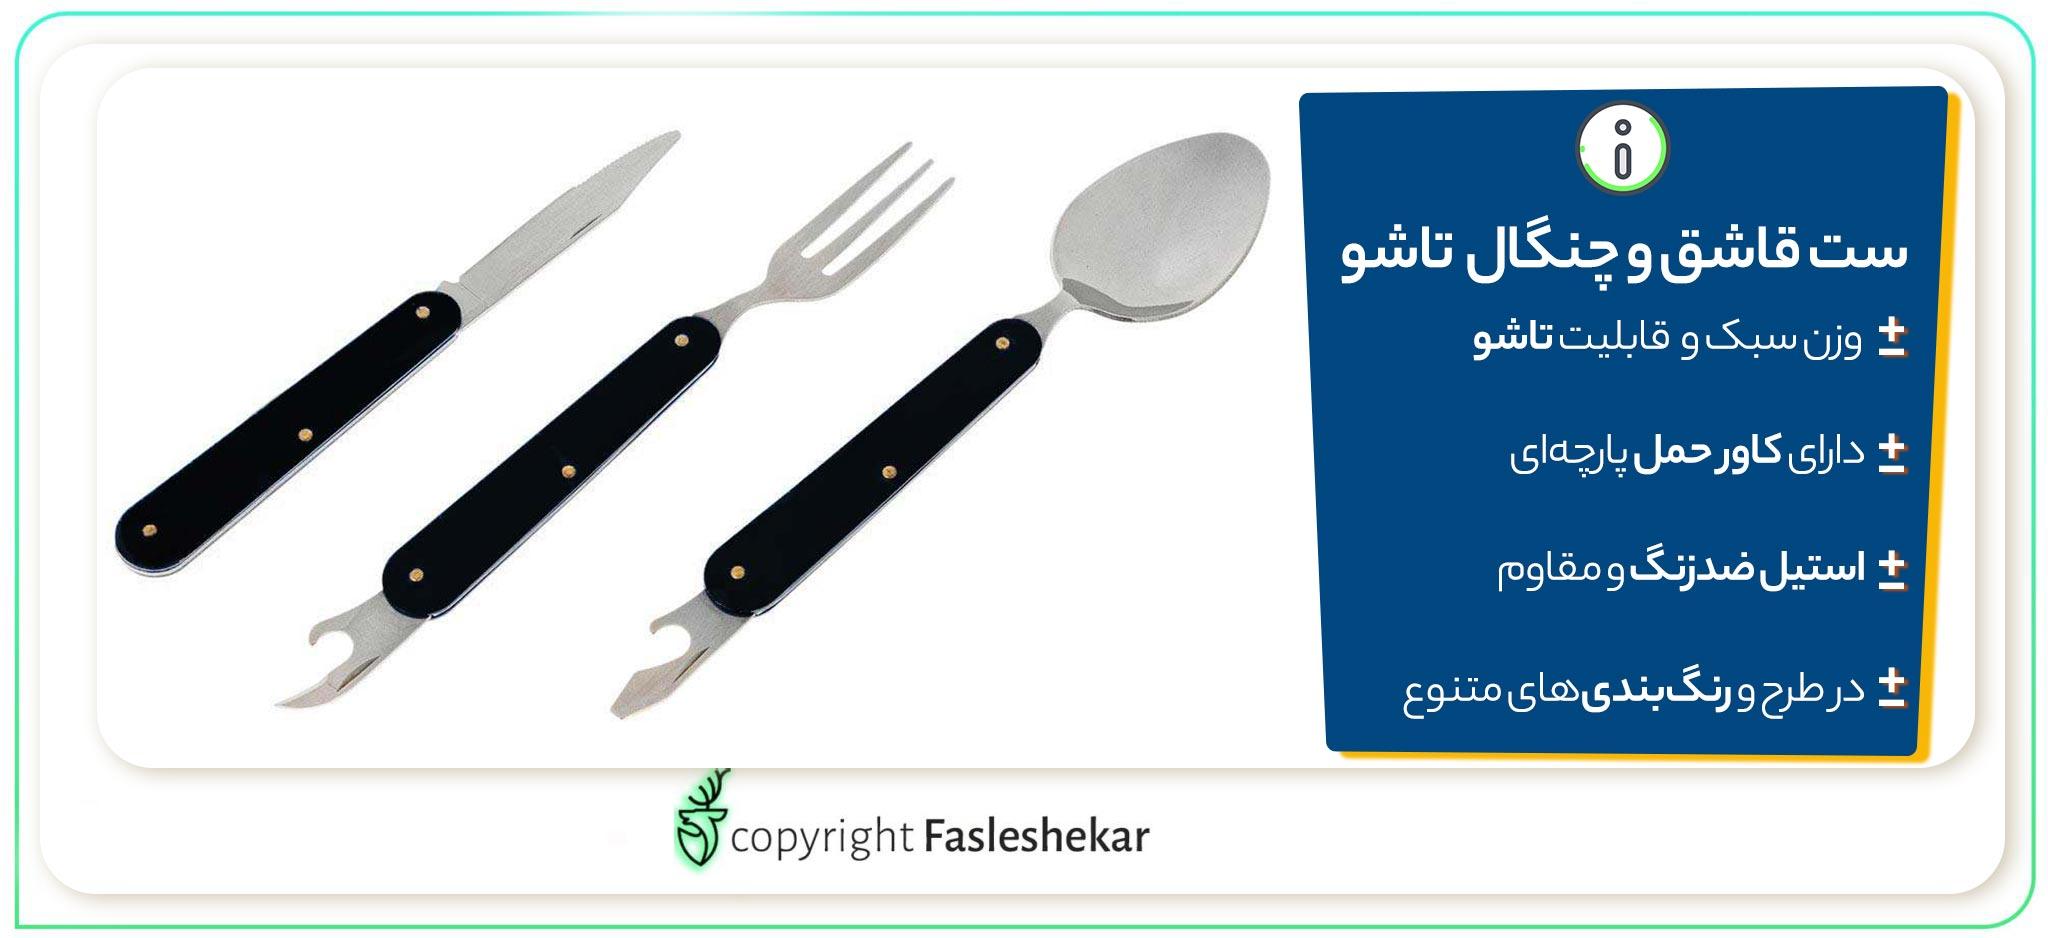 ست چنگال و چاقو